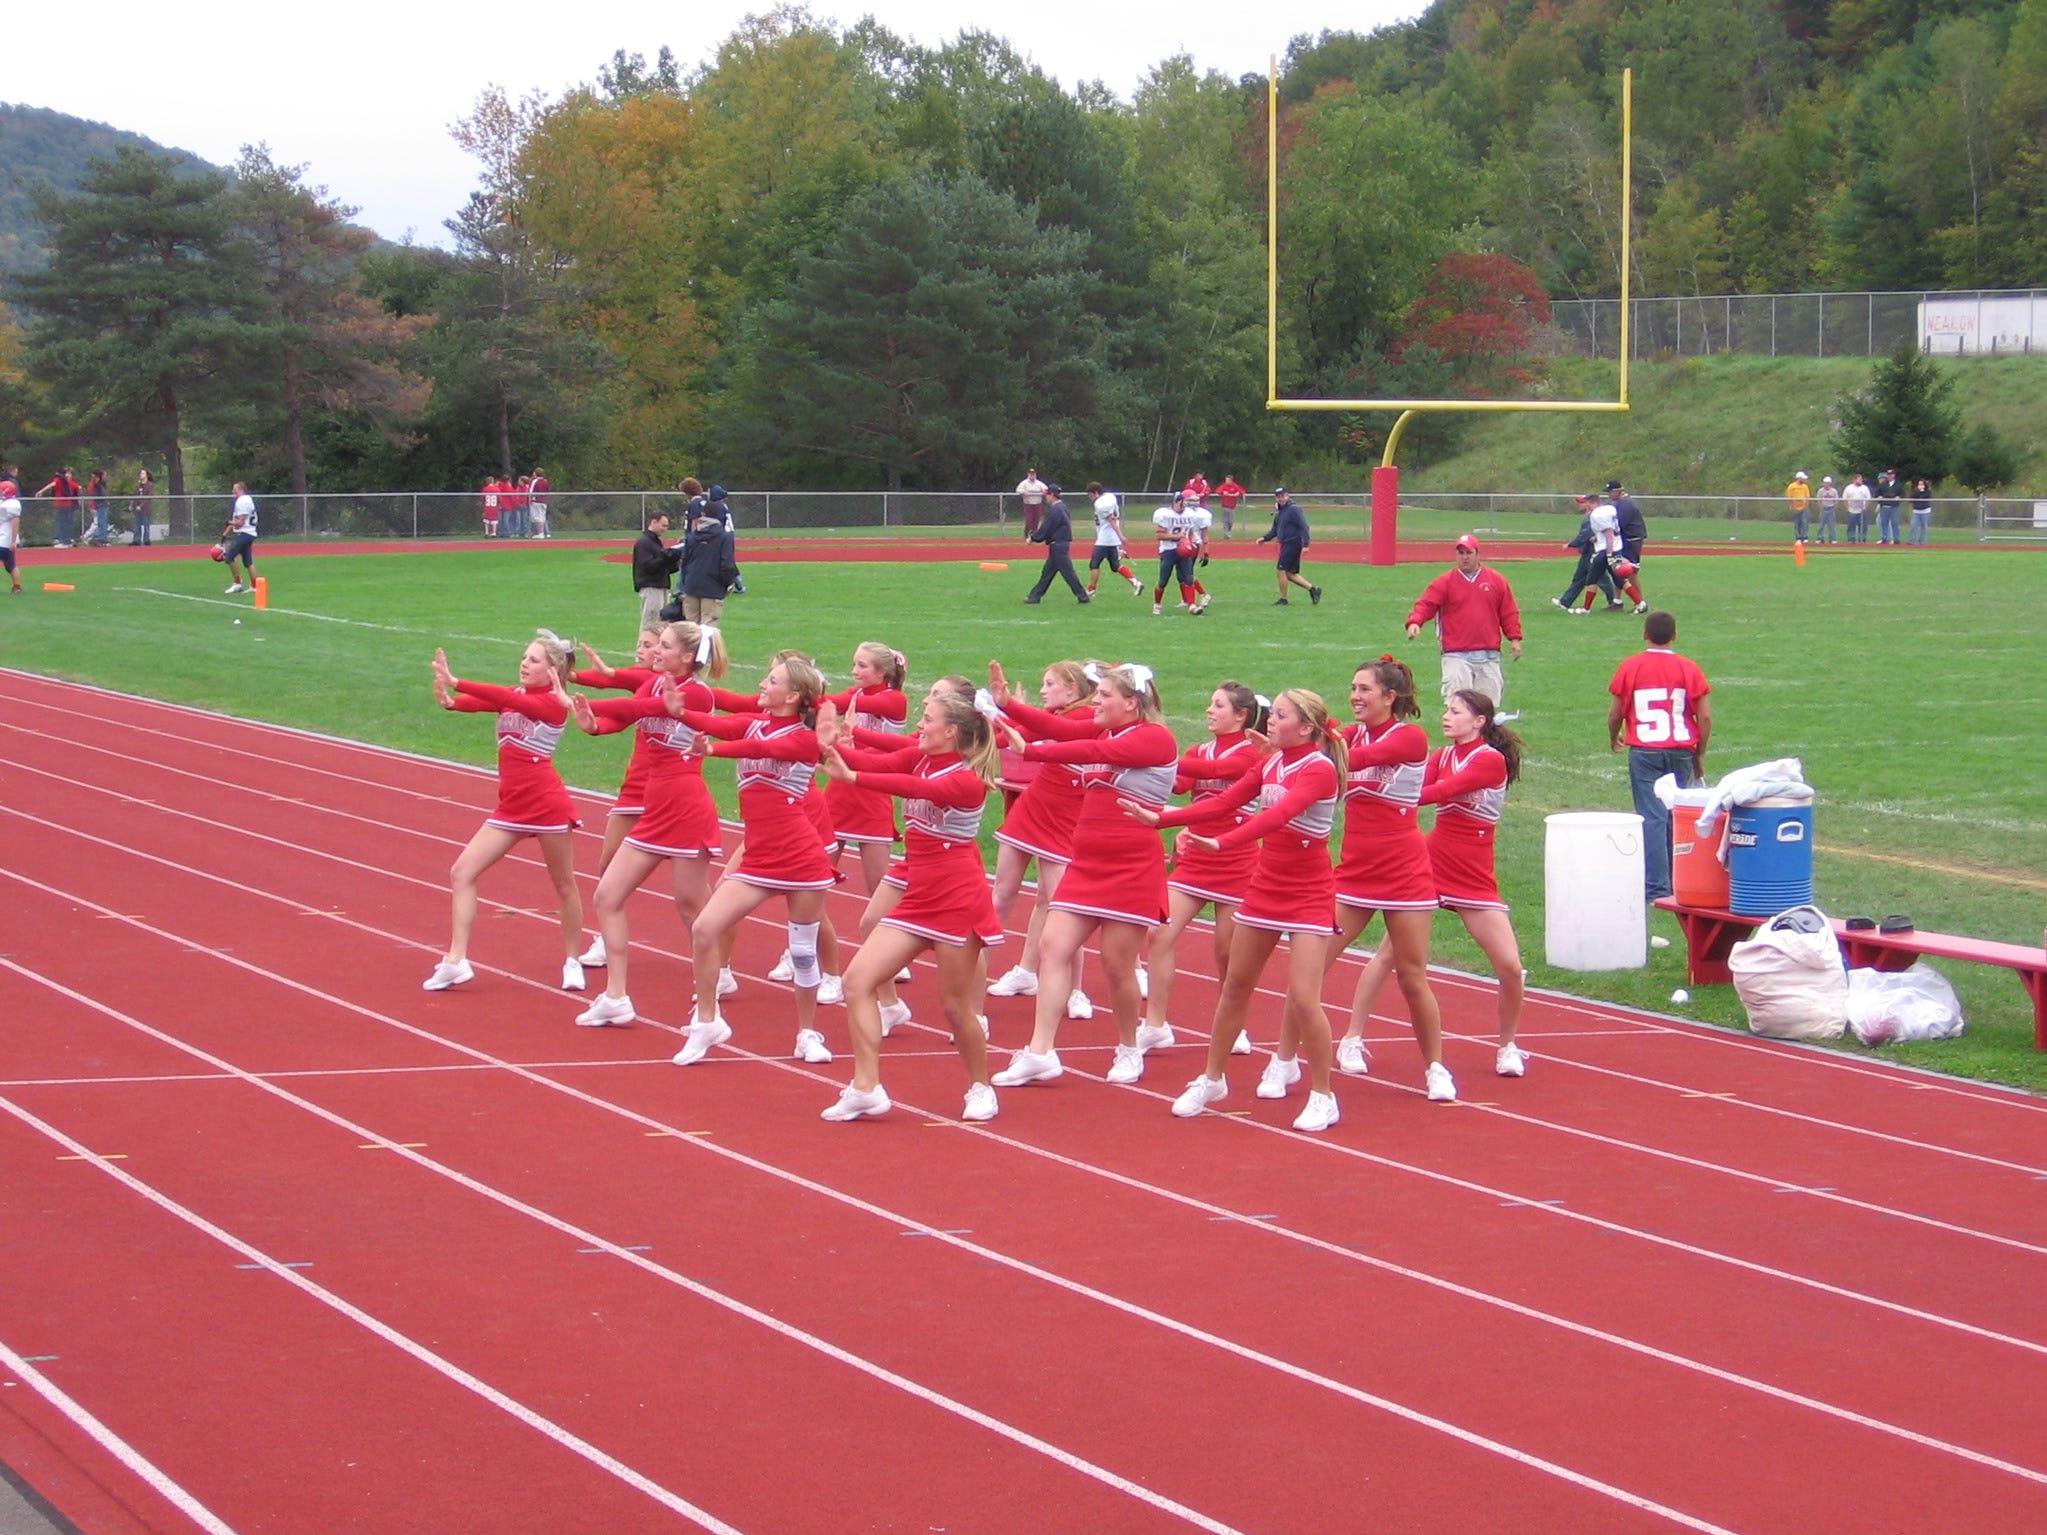 From 2018: Chenango Valley Cheerleaders show their school spirit